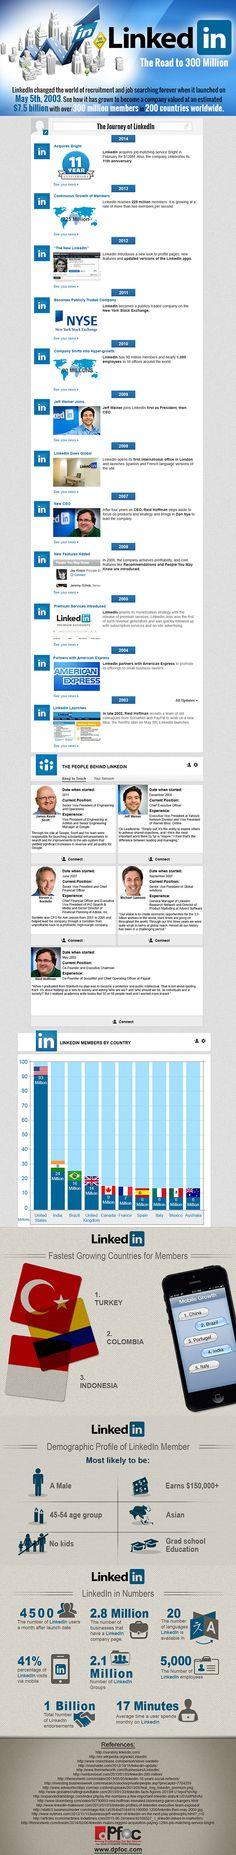 LinkedIn en chiffres (mai 2014)